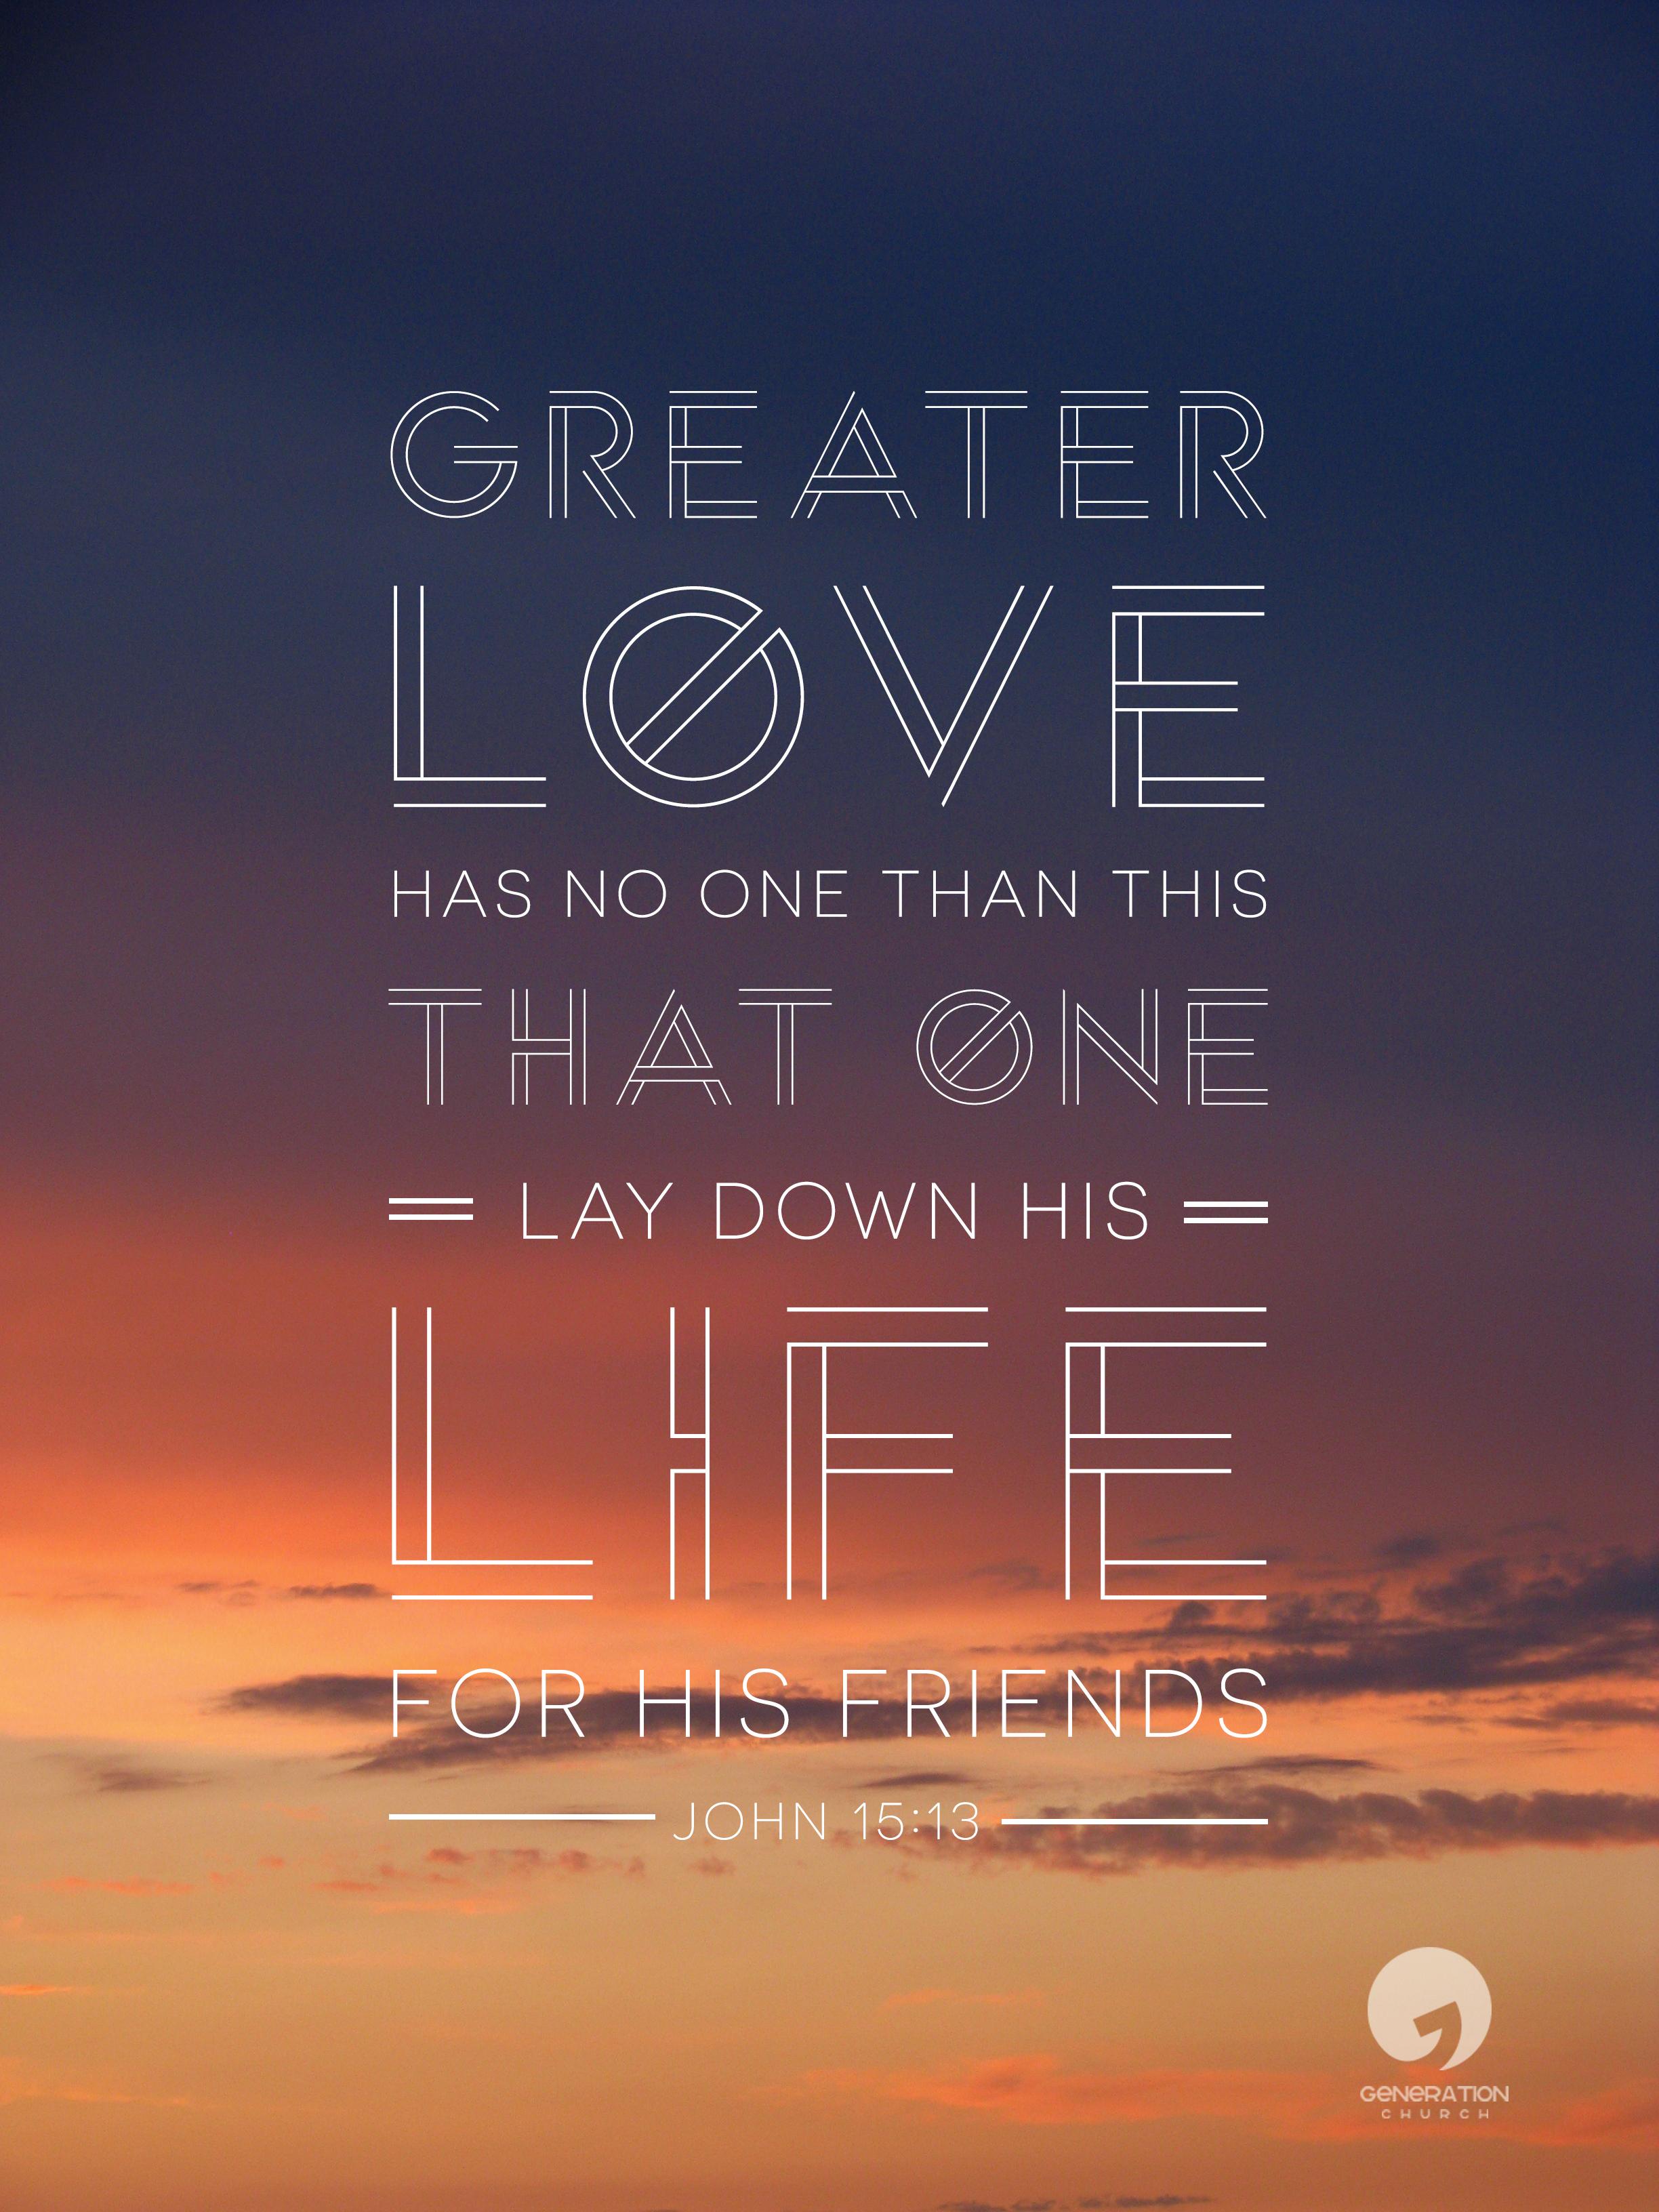 No greater love verse slide.jpg